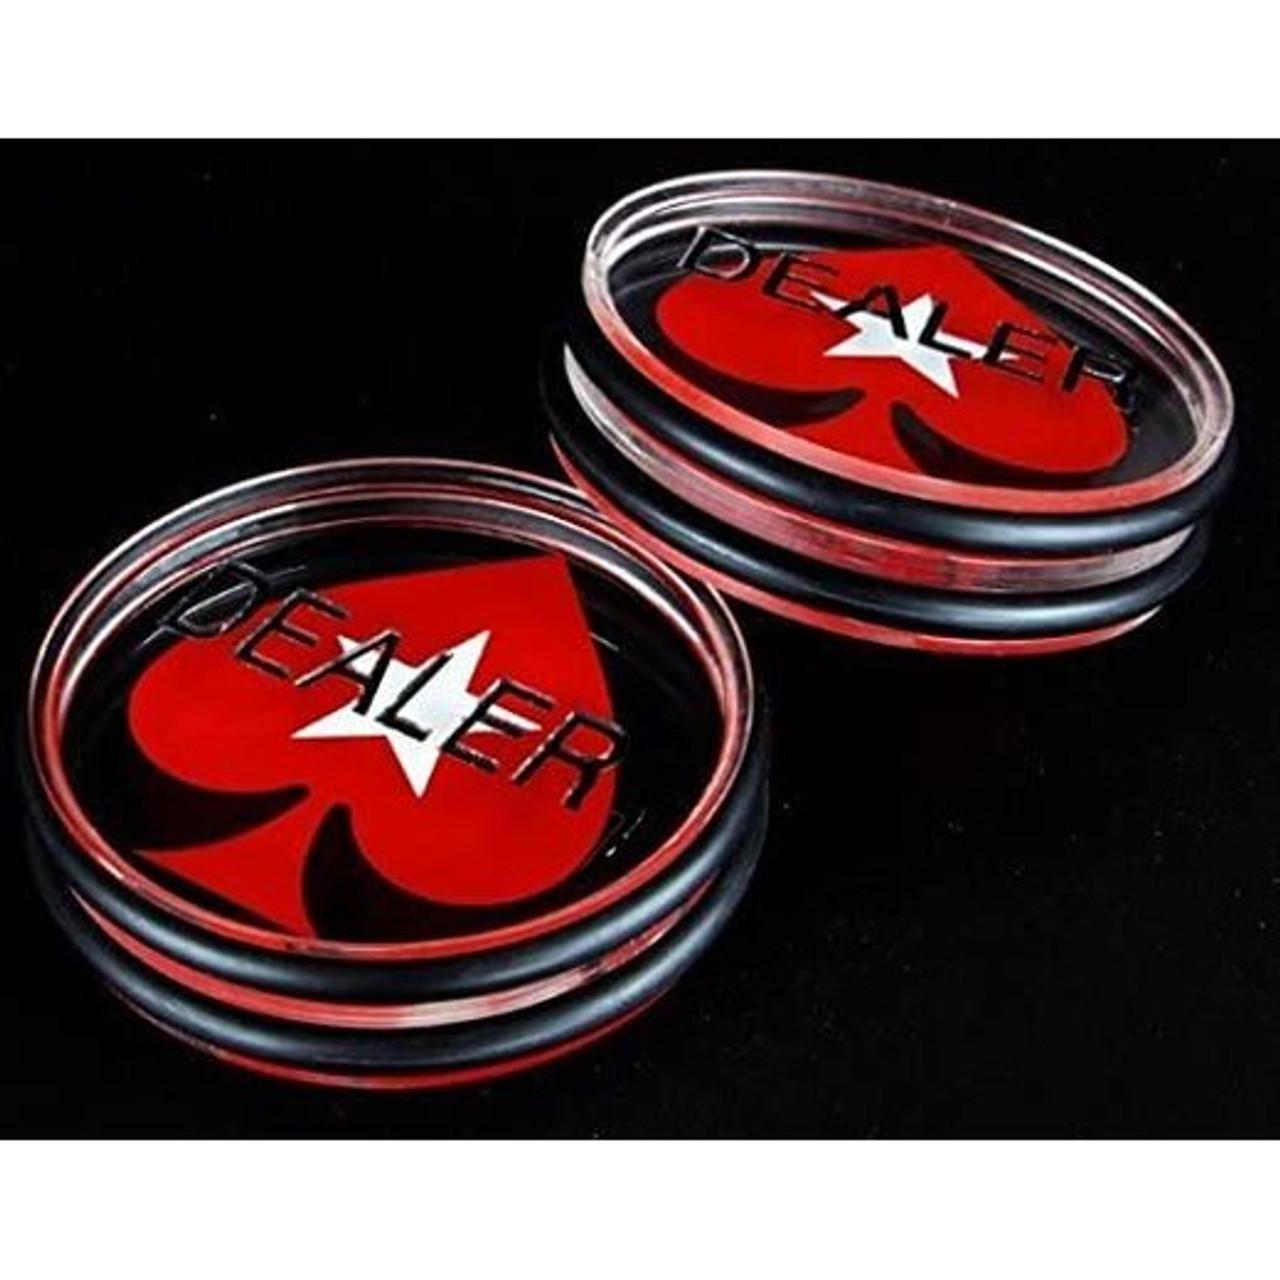 Pokerstars buton dealer acryl